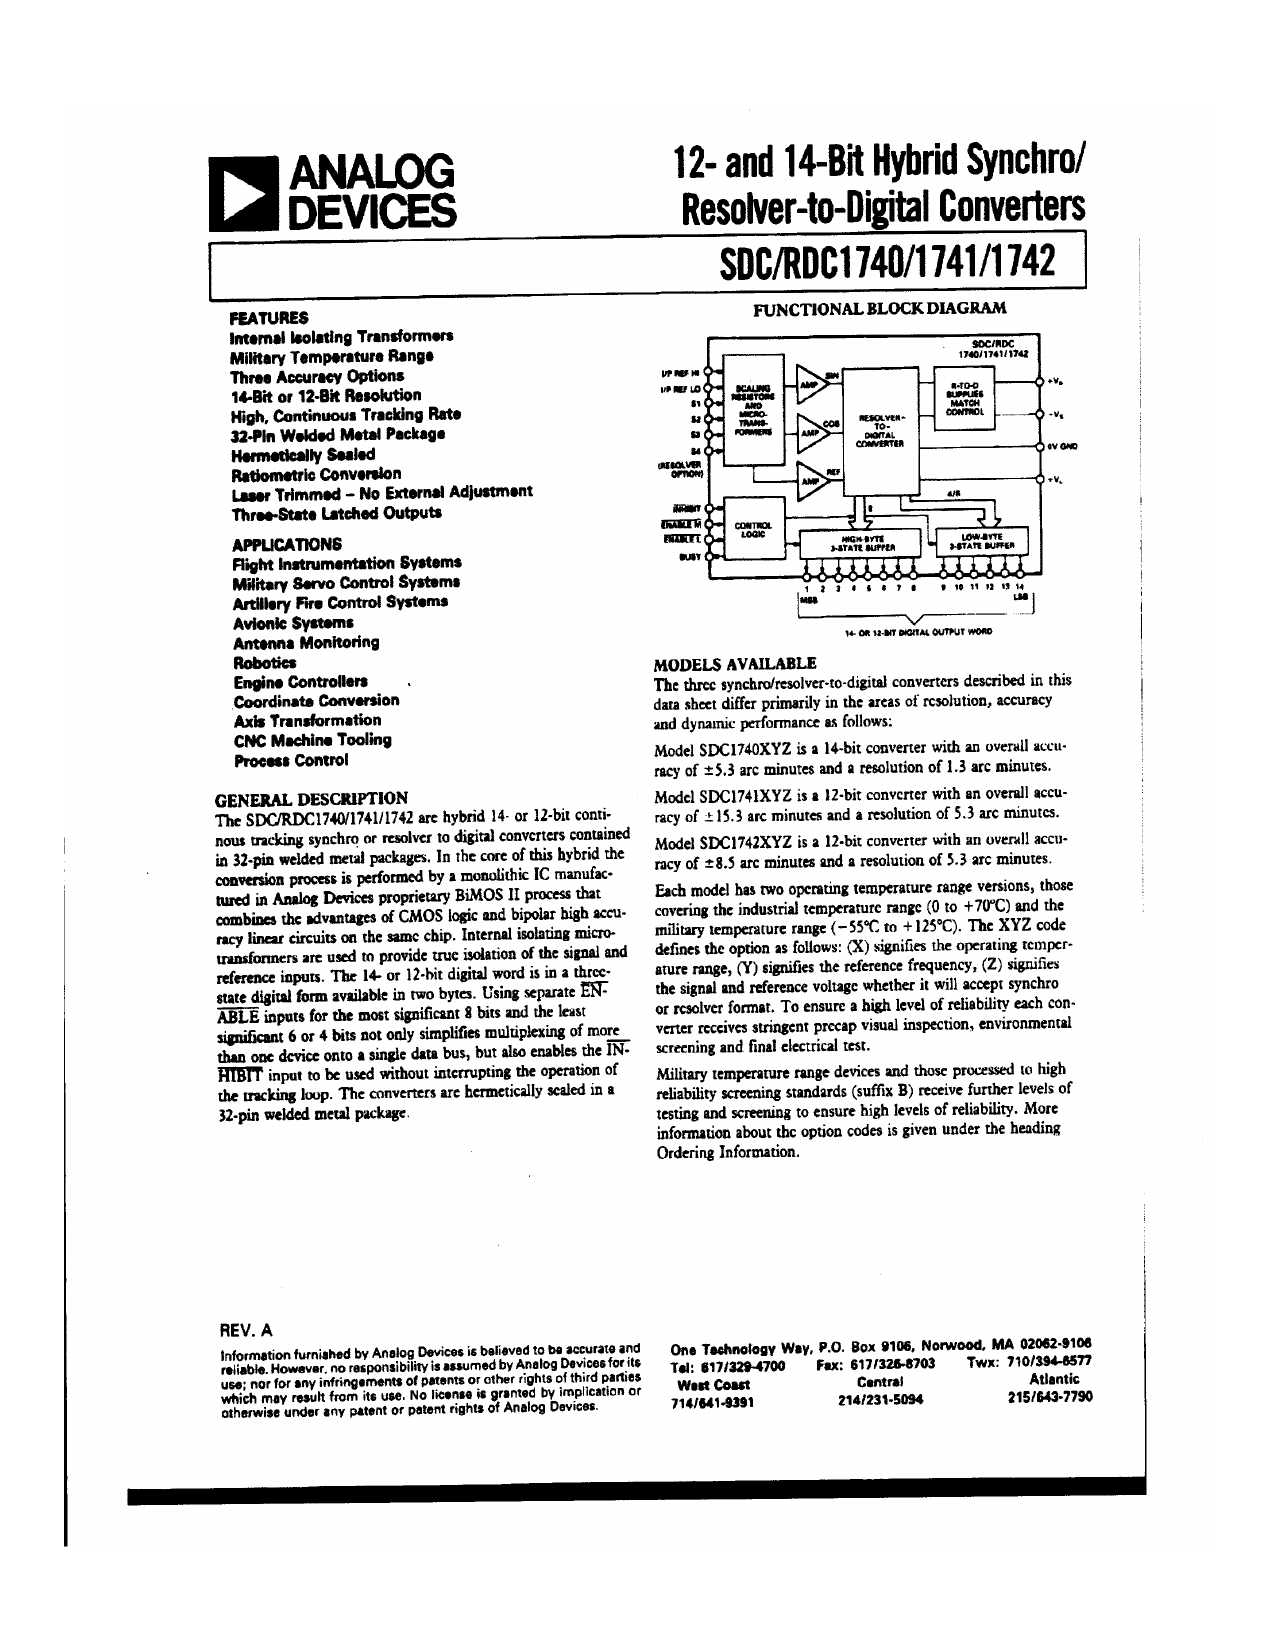 SDC1742 datasheet